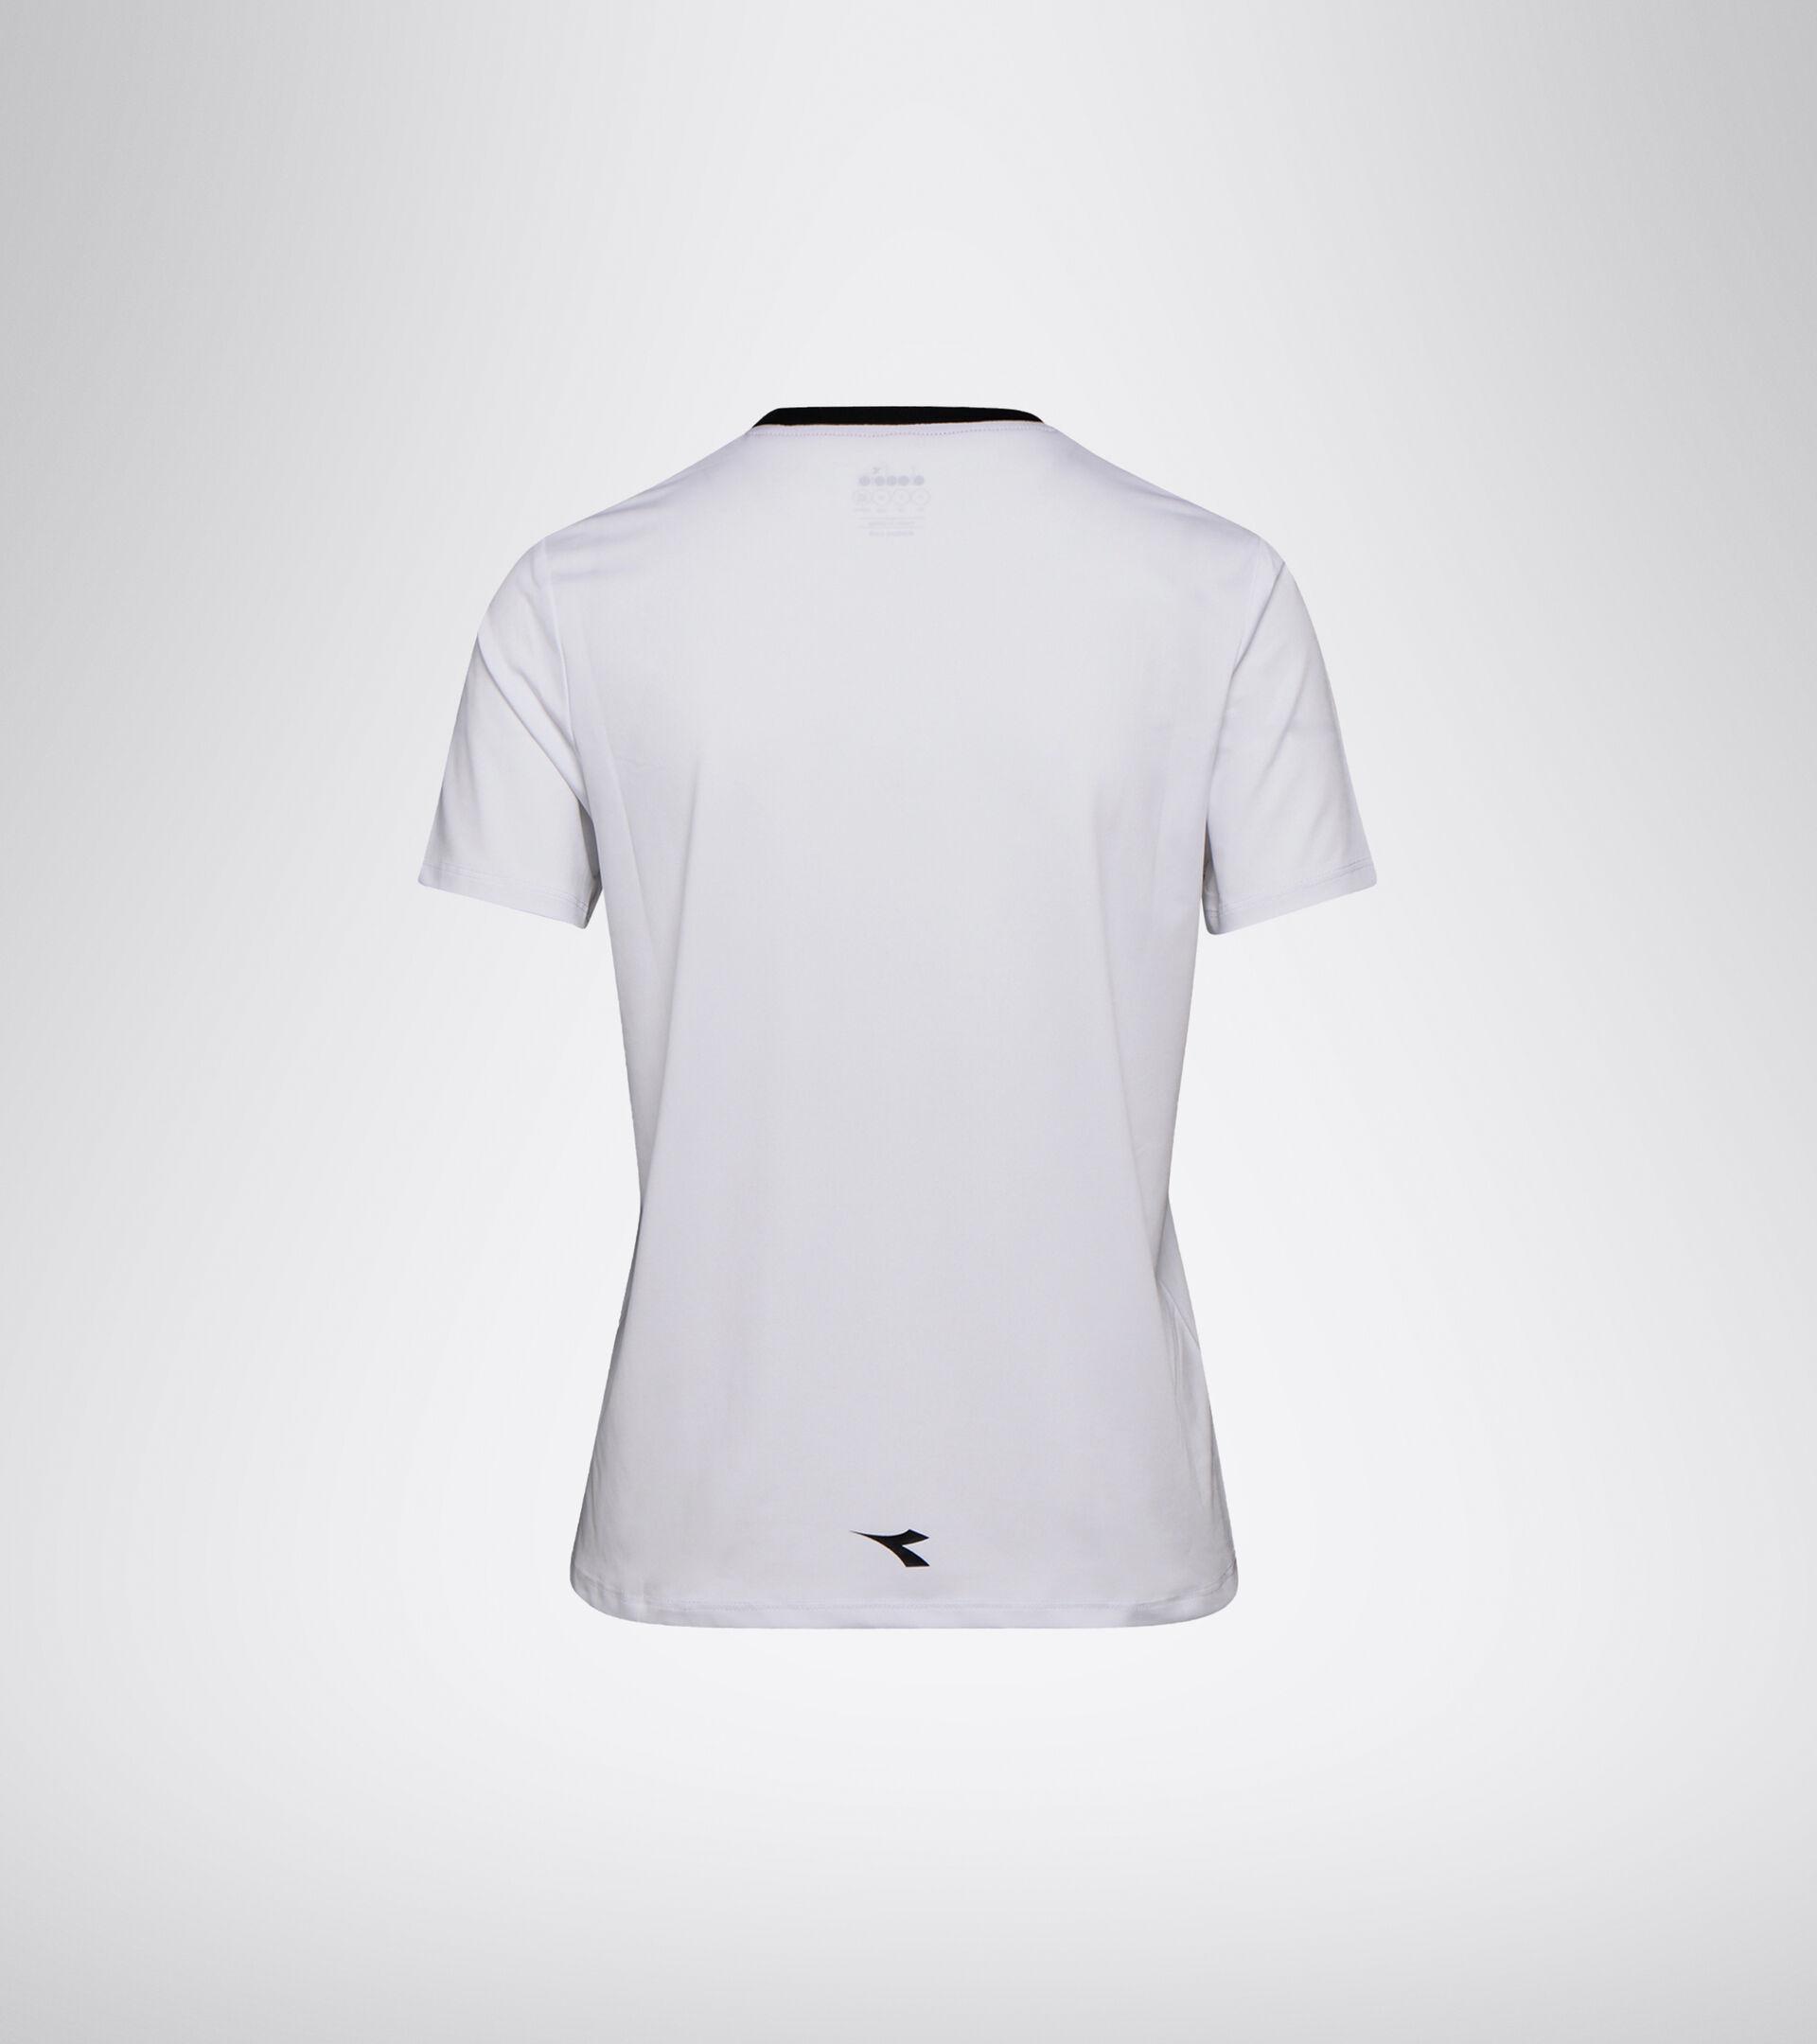 Camiseta de tenis - Mujer L. SS T-SHIRT BLANCO VIVO/NEGRO - Diadora